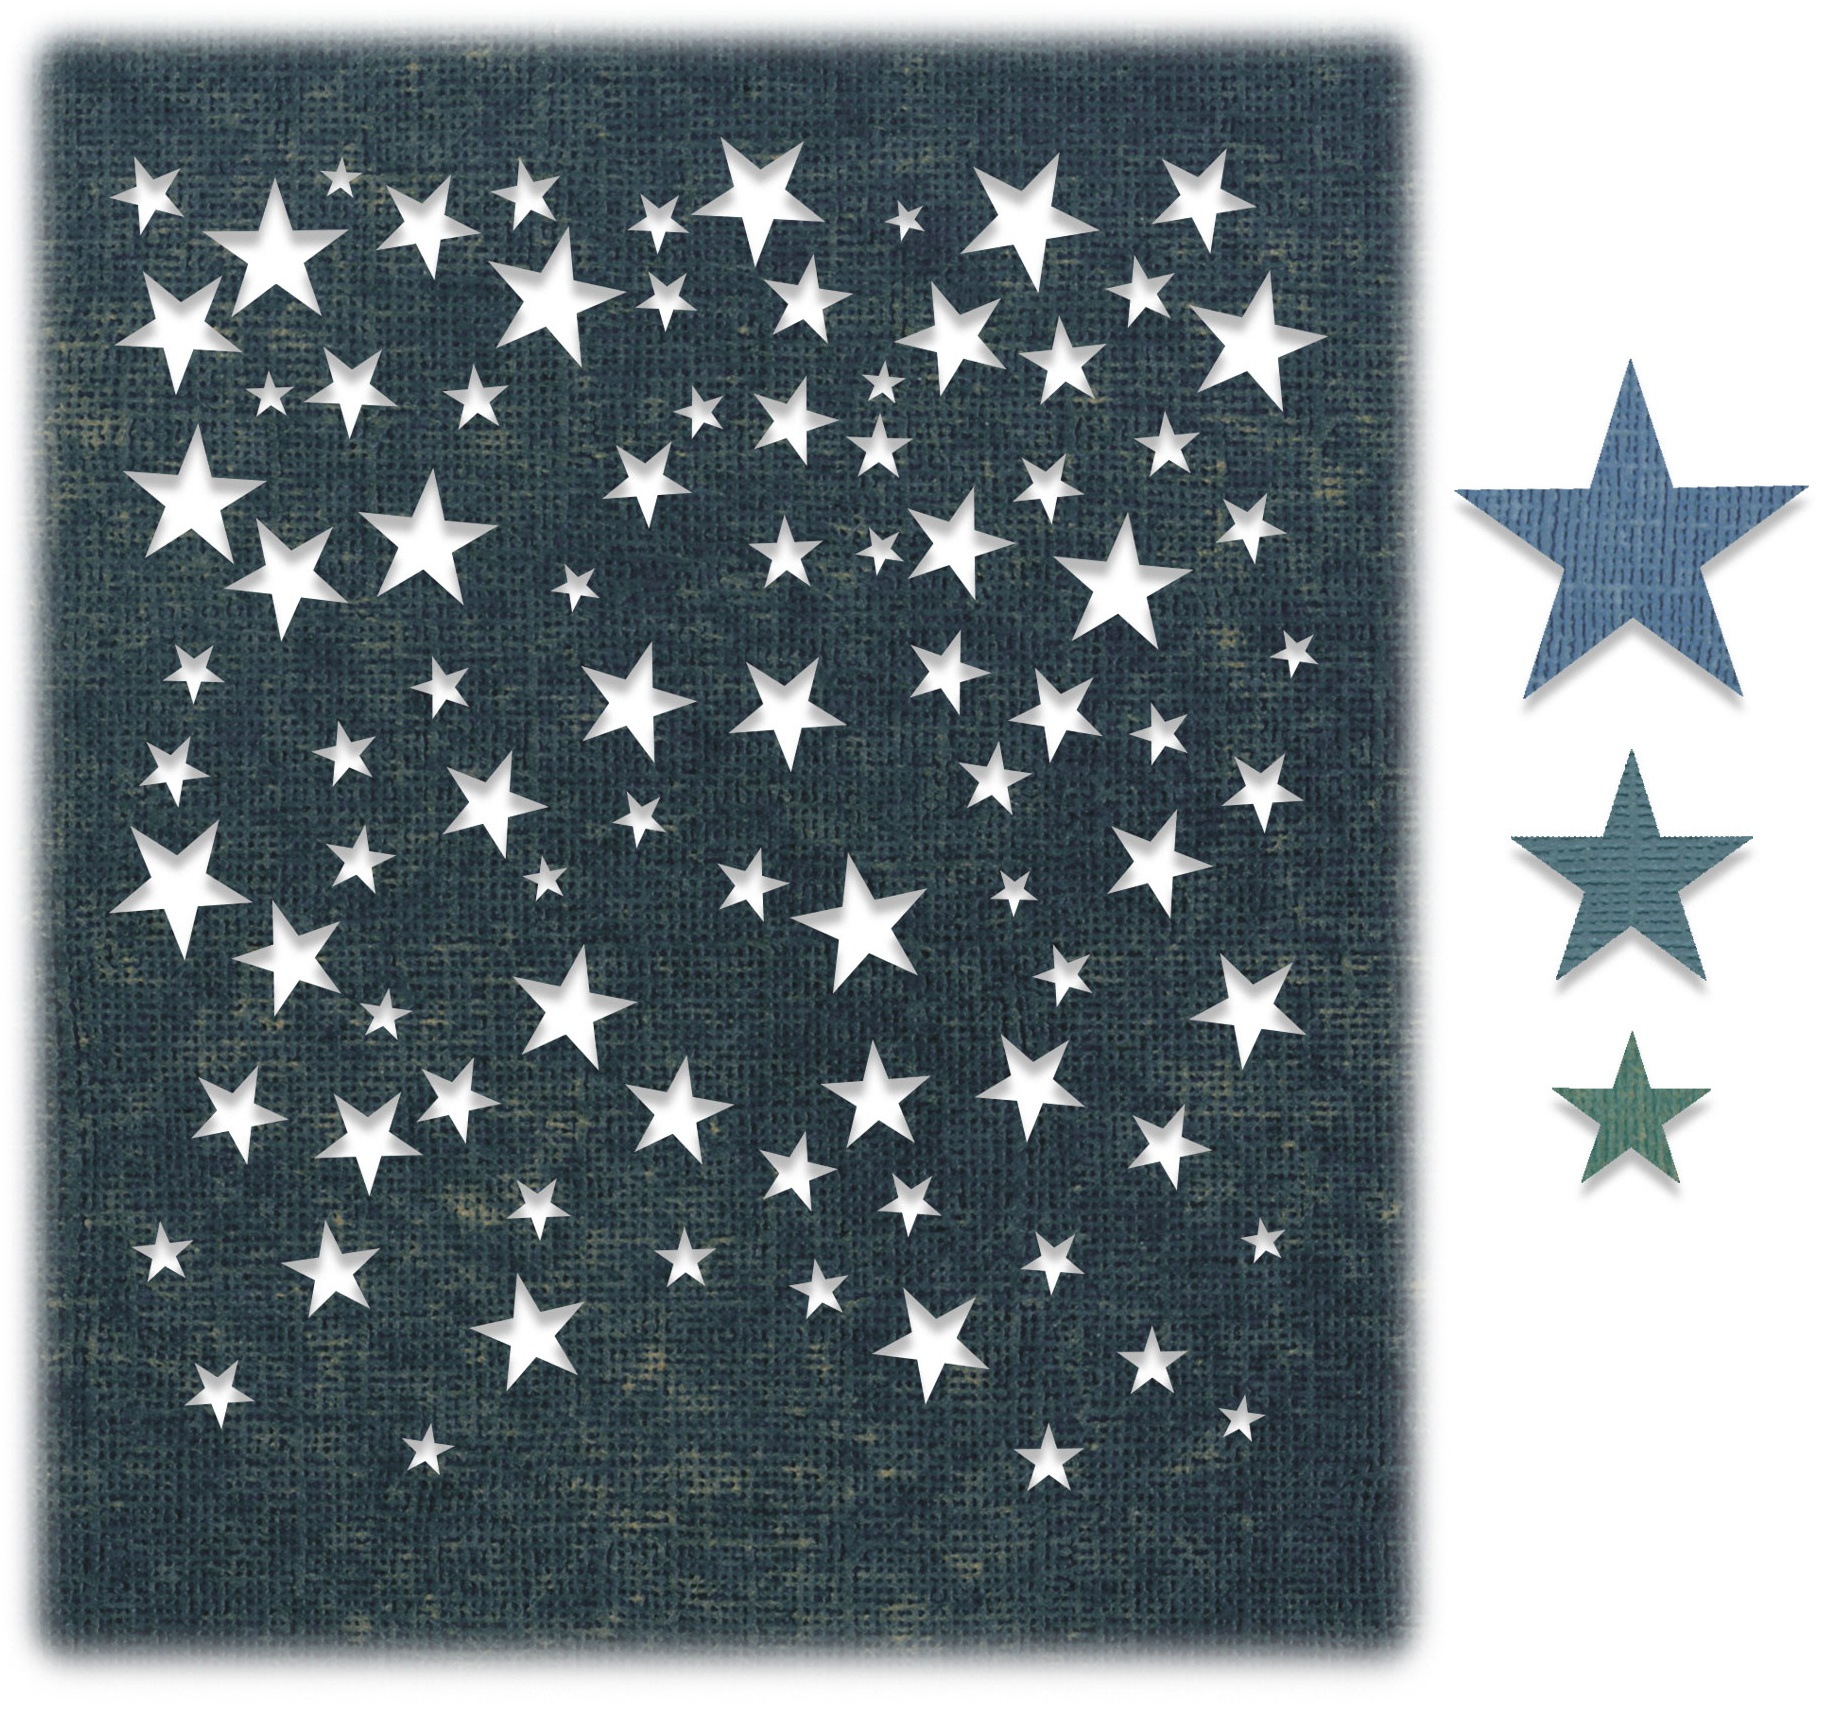 Sizzix Thinlits Dies By Tim Holtz 4/Pkg-Falling Stars